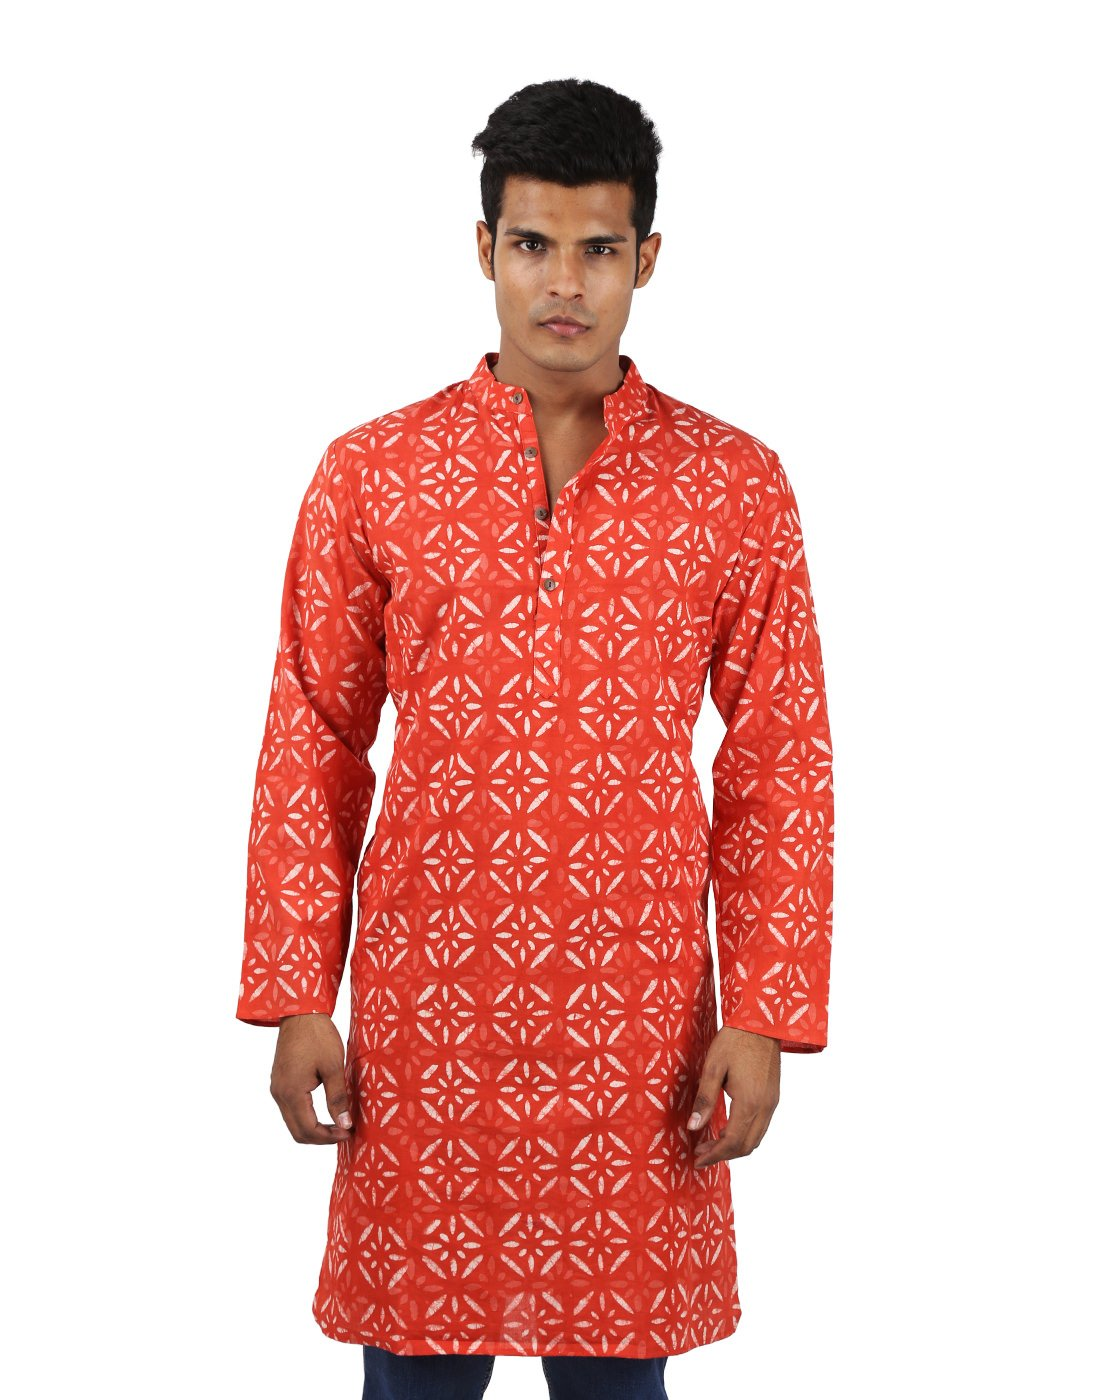 Indian Designer Handmade Cotton Short Mens Kurta Casual Punjabi Traditional Wear Clothing, Dark Peach